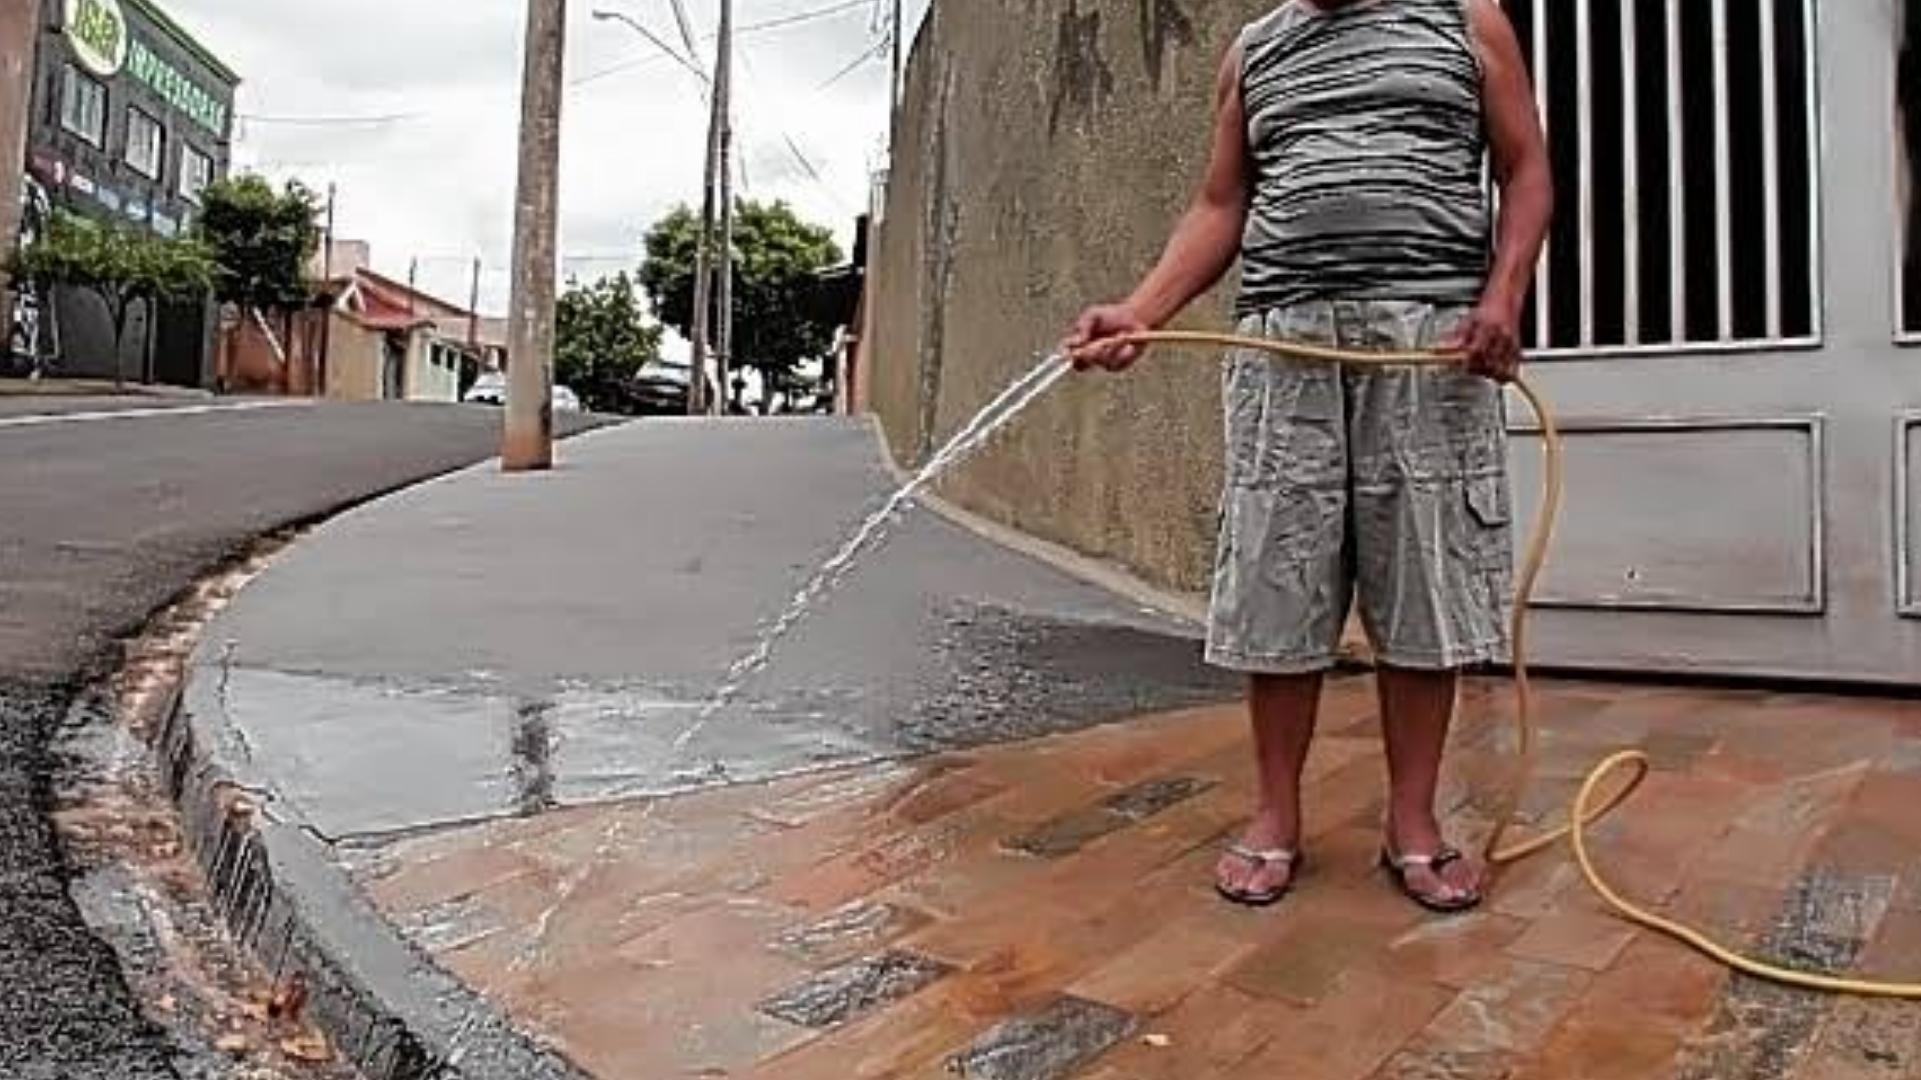 Quem desperdiçar água em Sorocaba poderá levar multa alta do SAAE